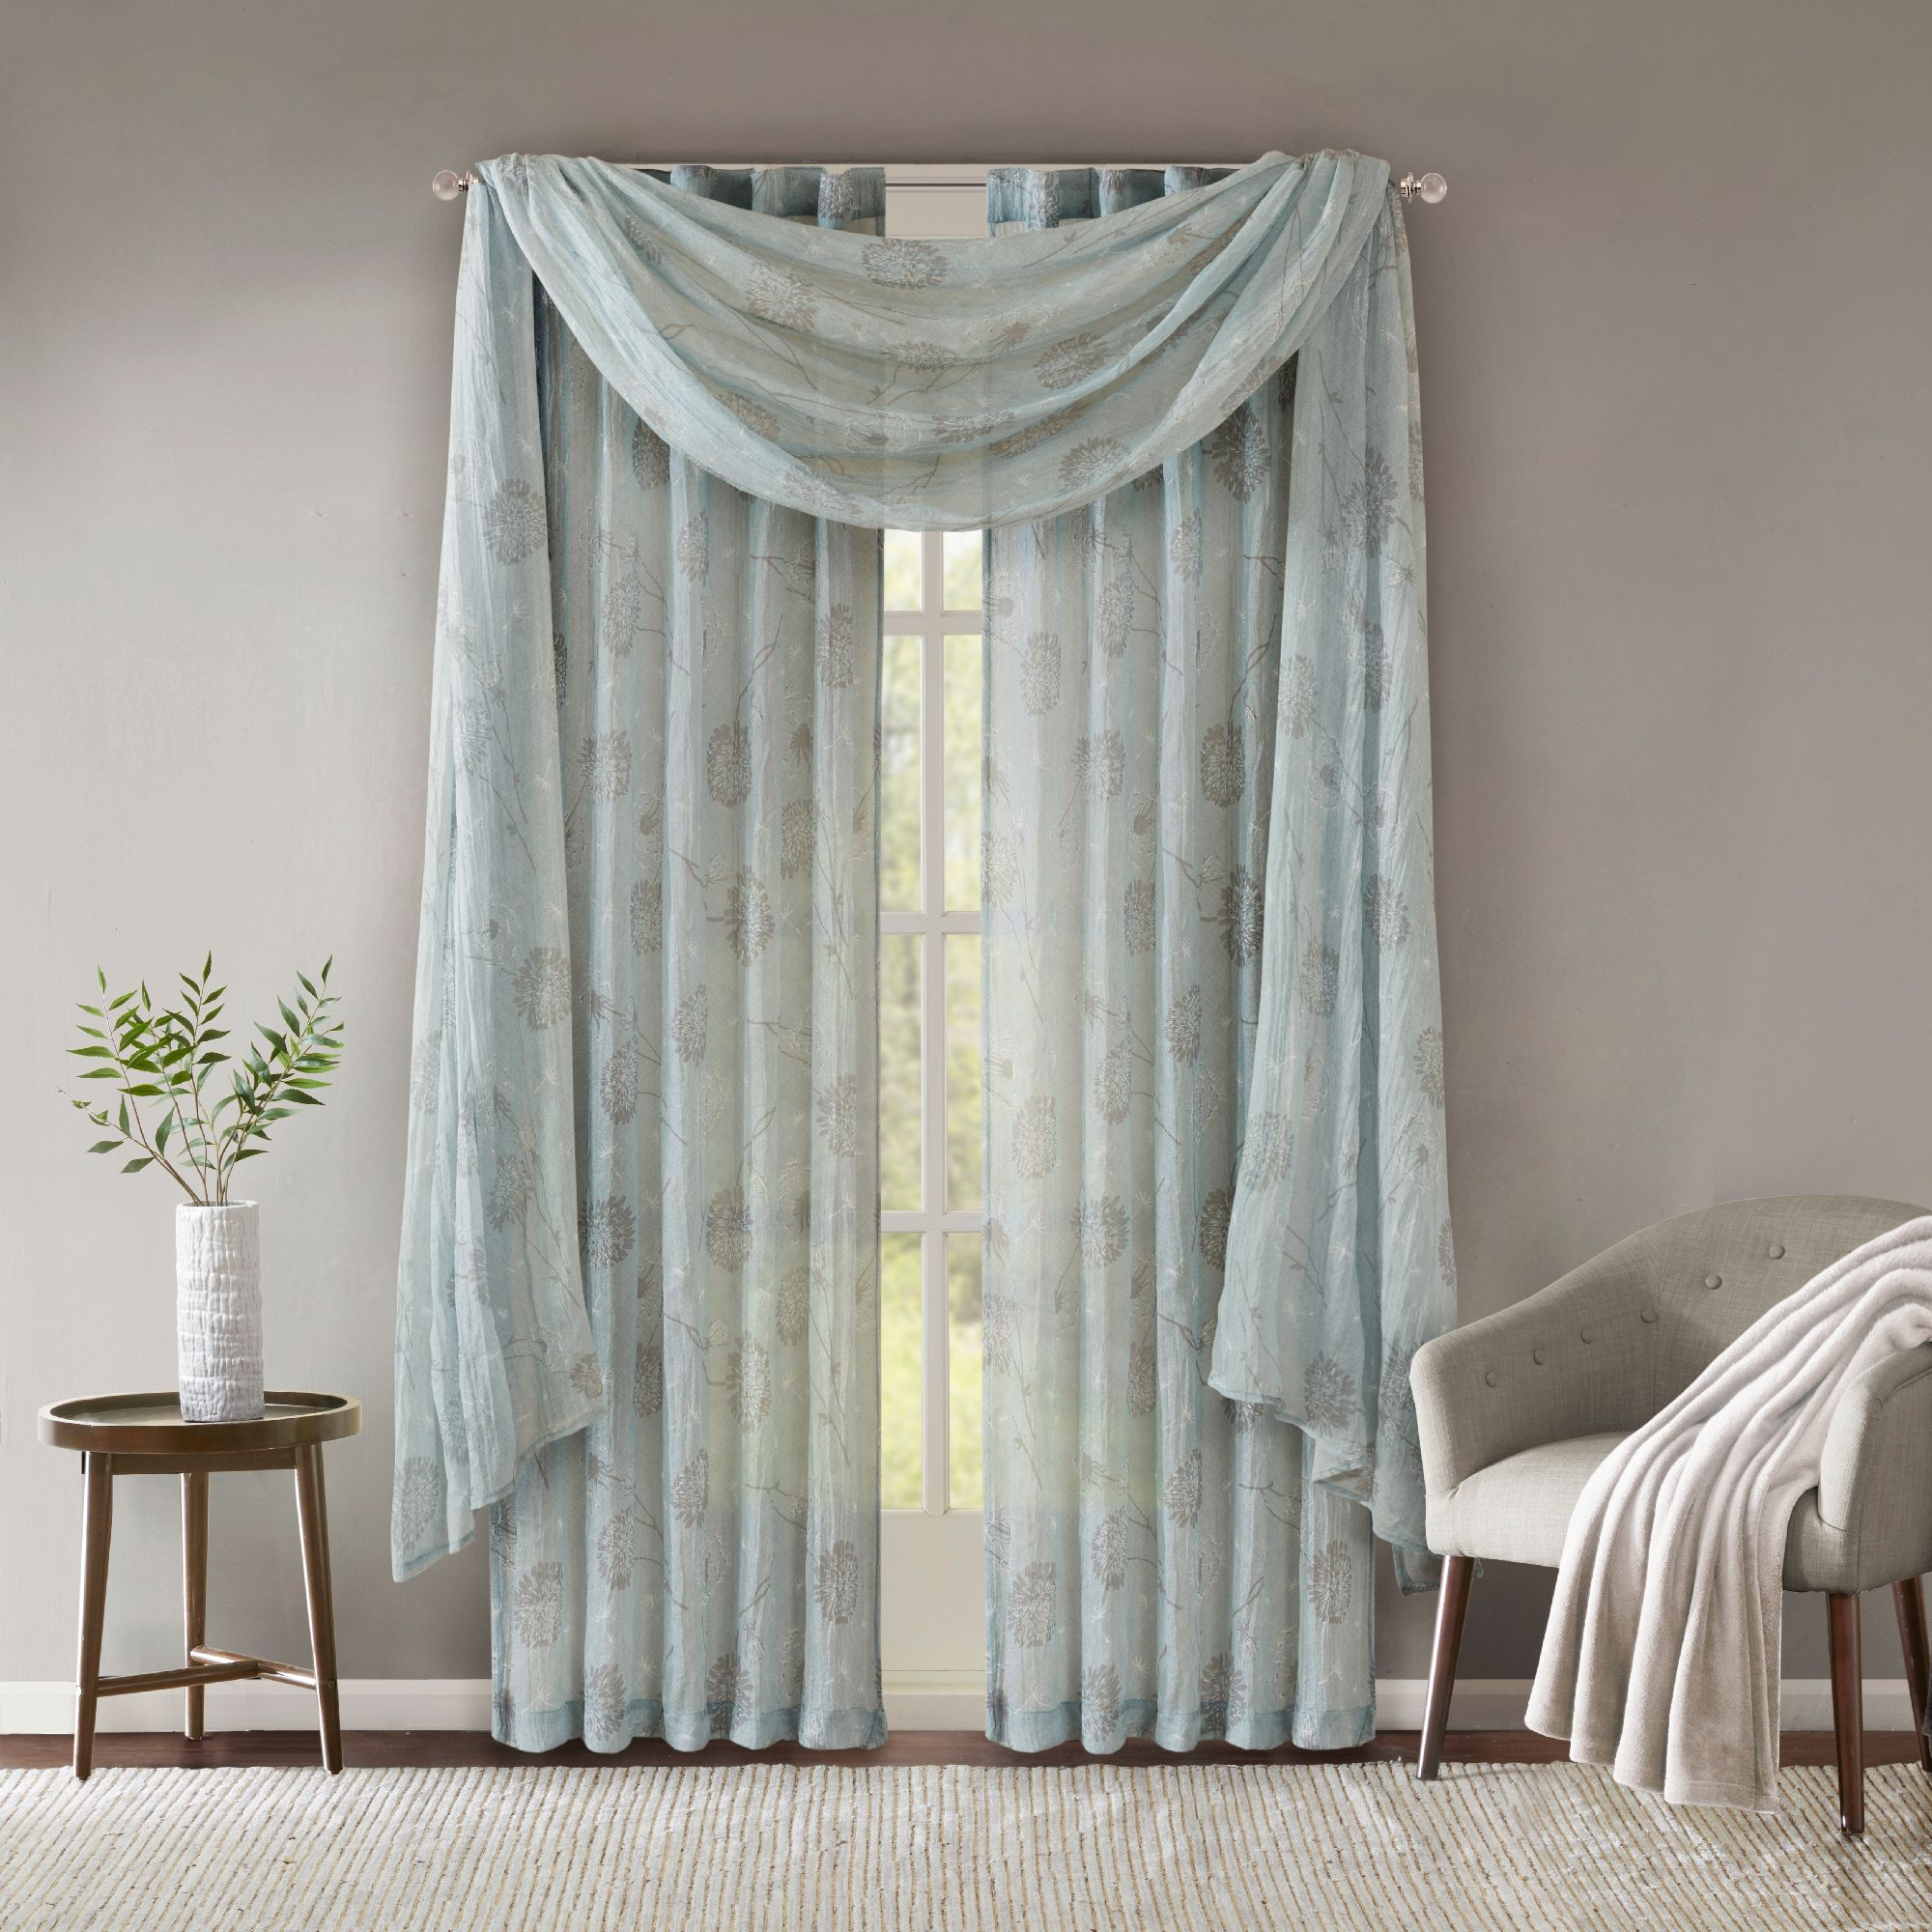 Home Essence Aer Printed Crushed Scarf Sheer Walmart Com Valances For Living Room Home Essence Rod Pocket Curtain Panels #scarf #curtains #for #living #room